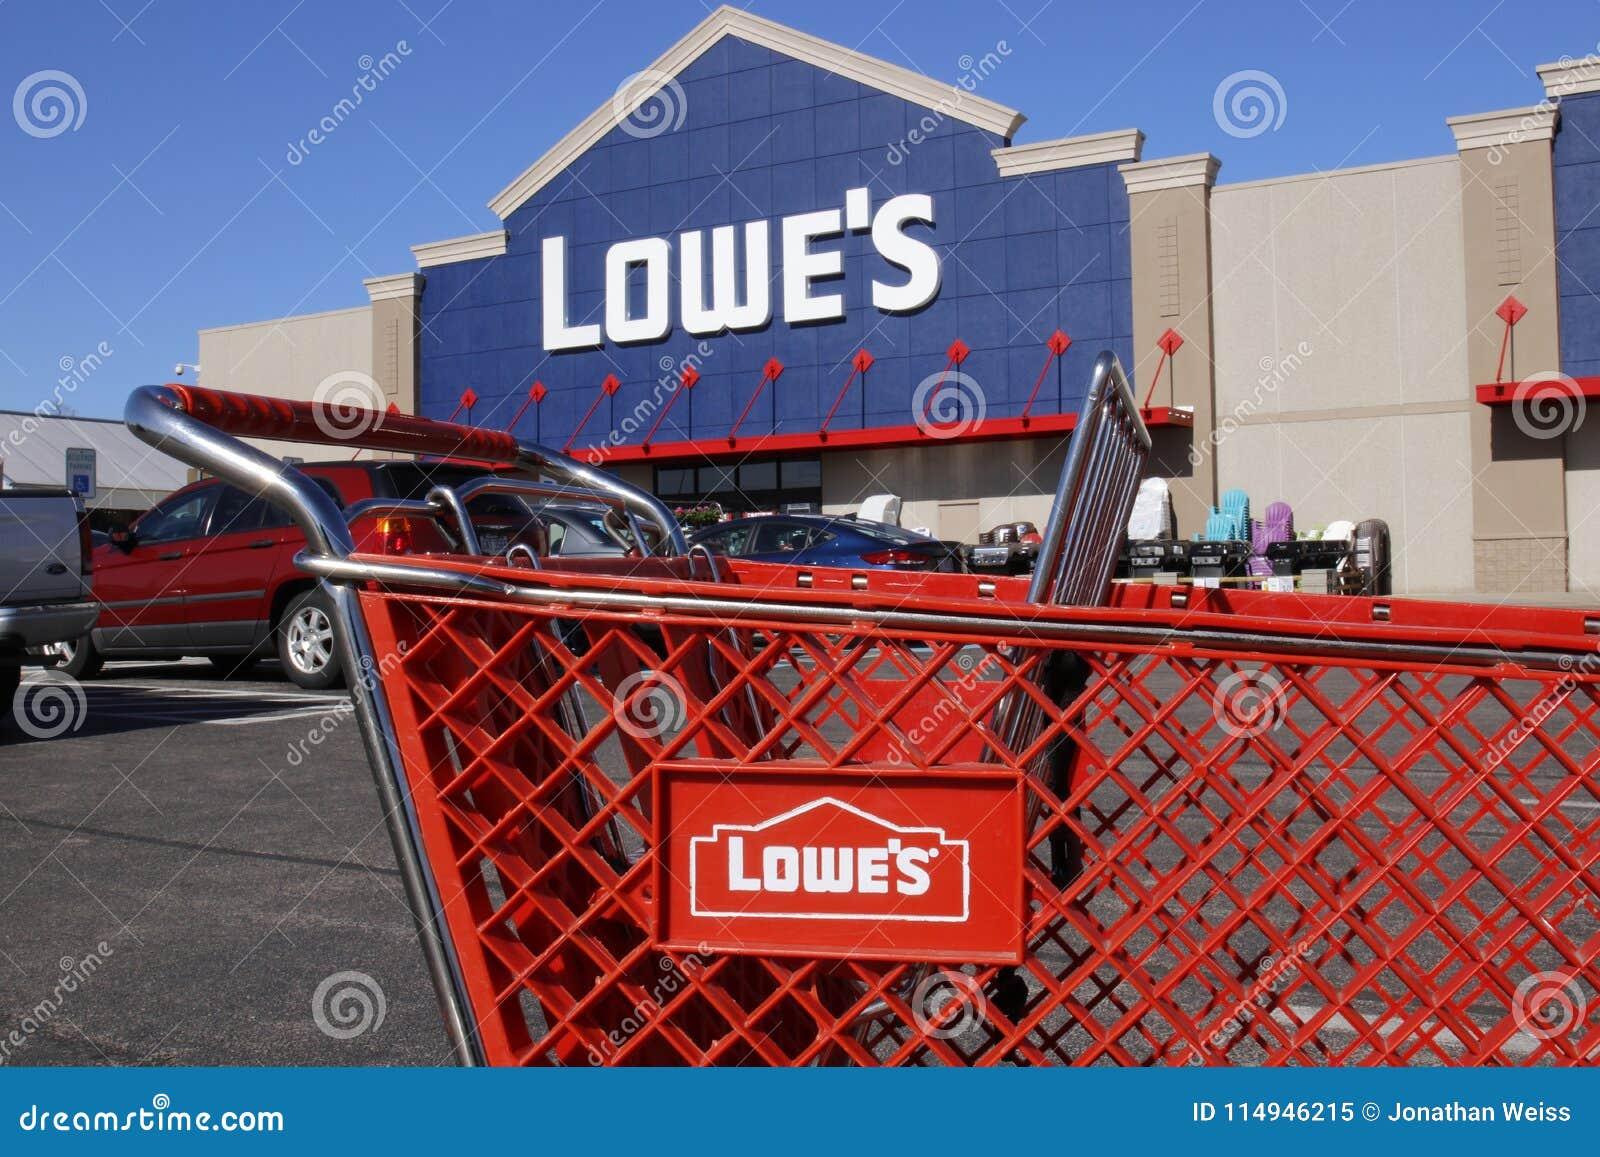 b7ed7cd223 Greenville - Circa April 2018  Lowe s Home Improvement Warehouse. Lowe s operates  retail